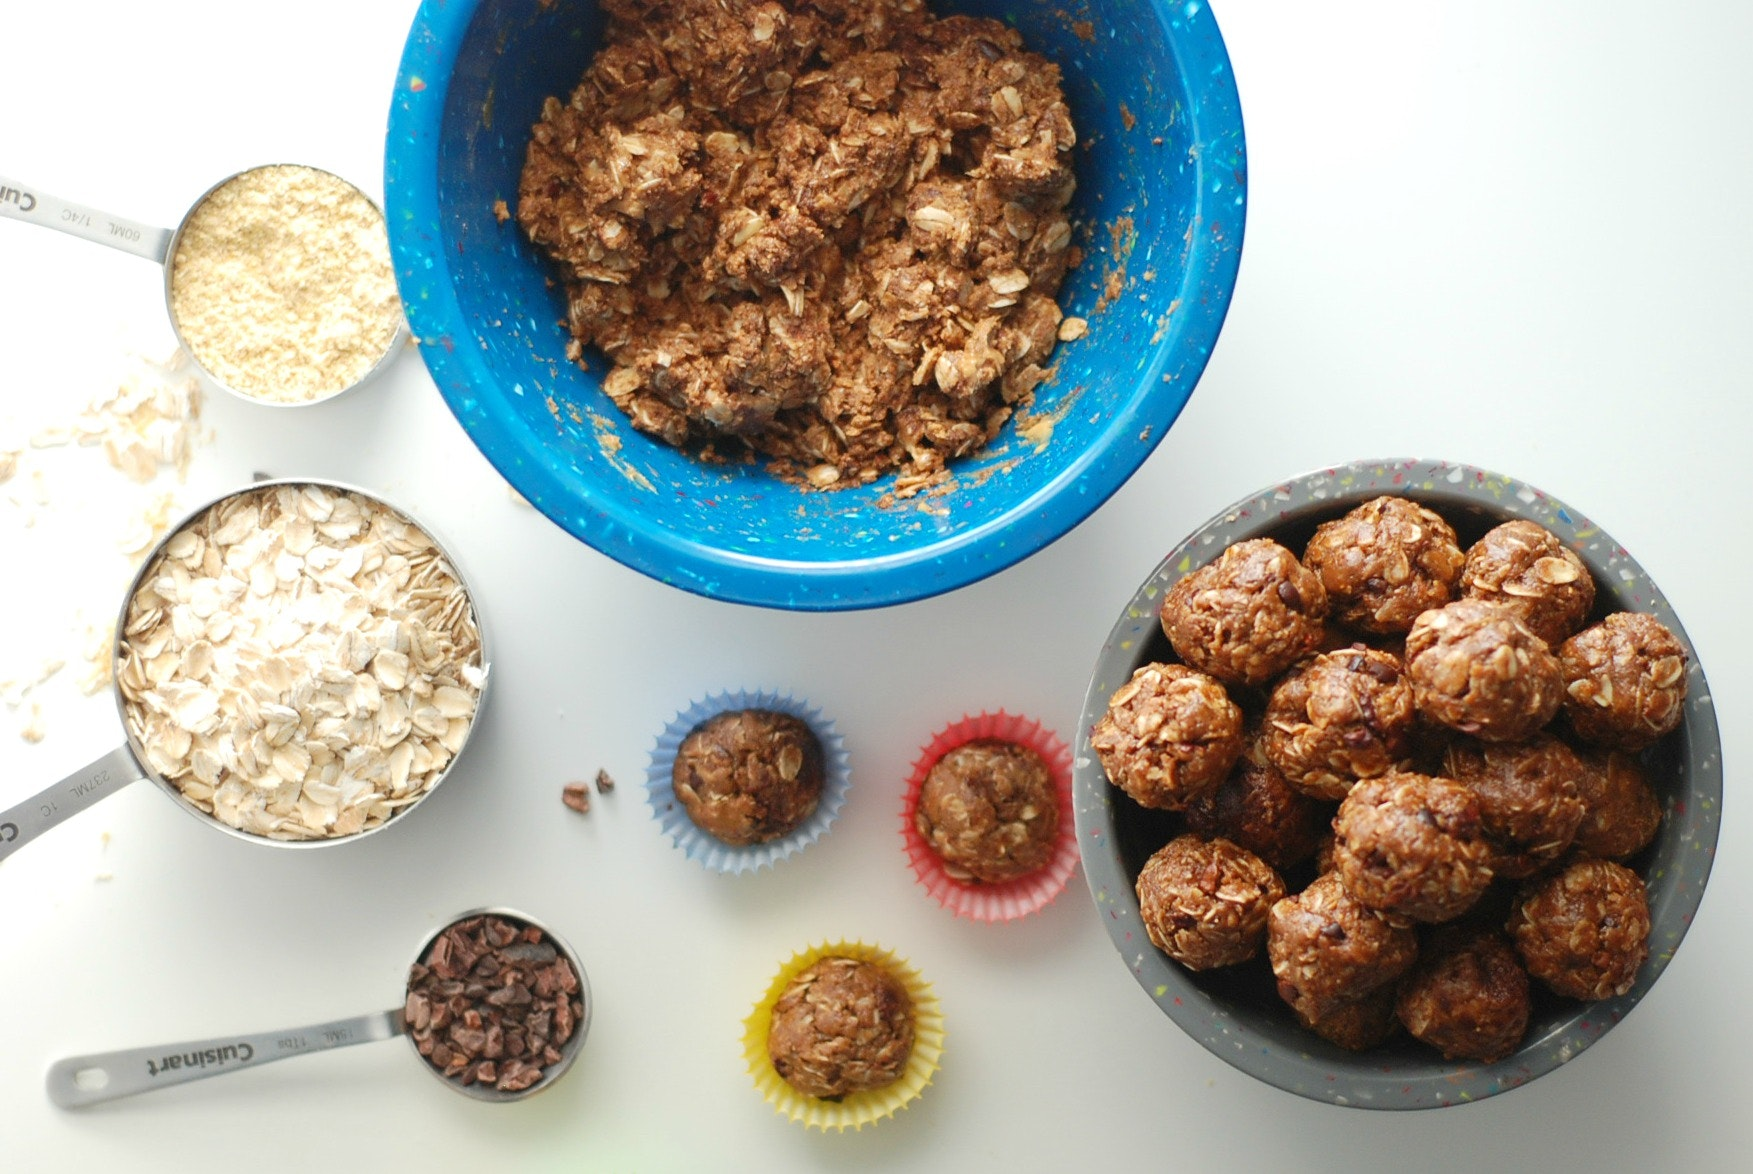 How to Make Homemade No Bake Snack Balls & Energy Bites